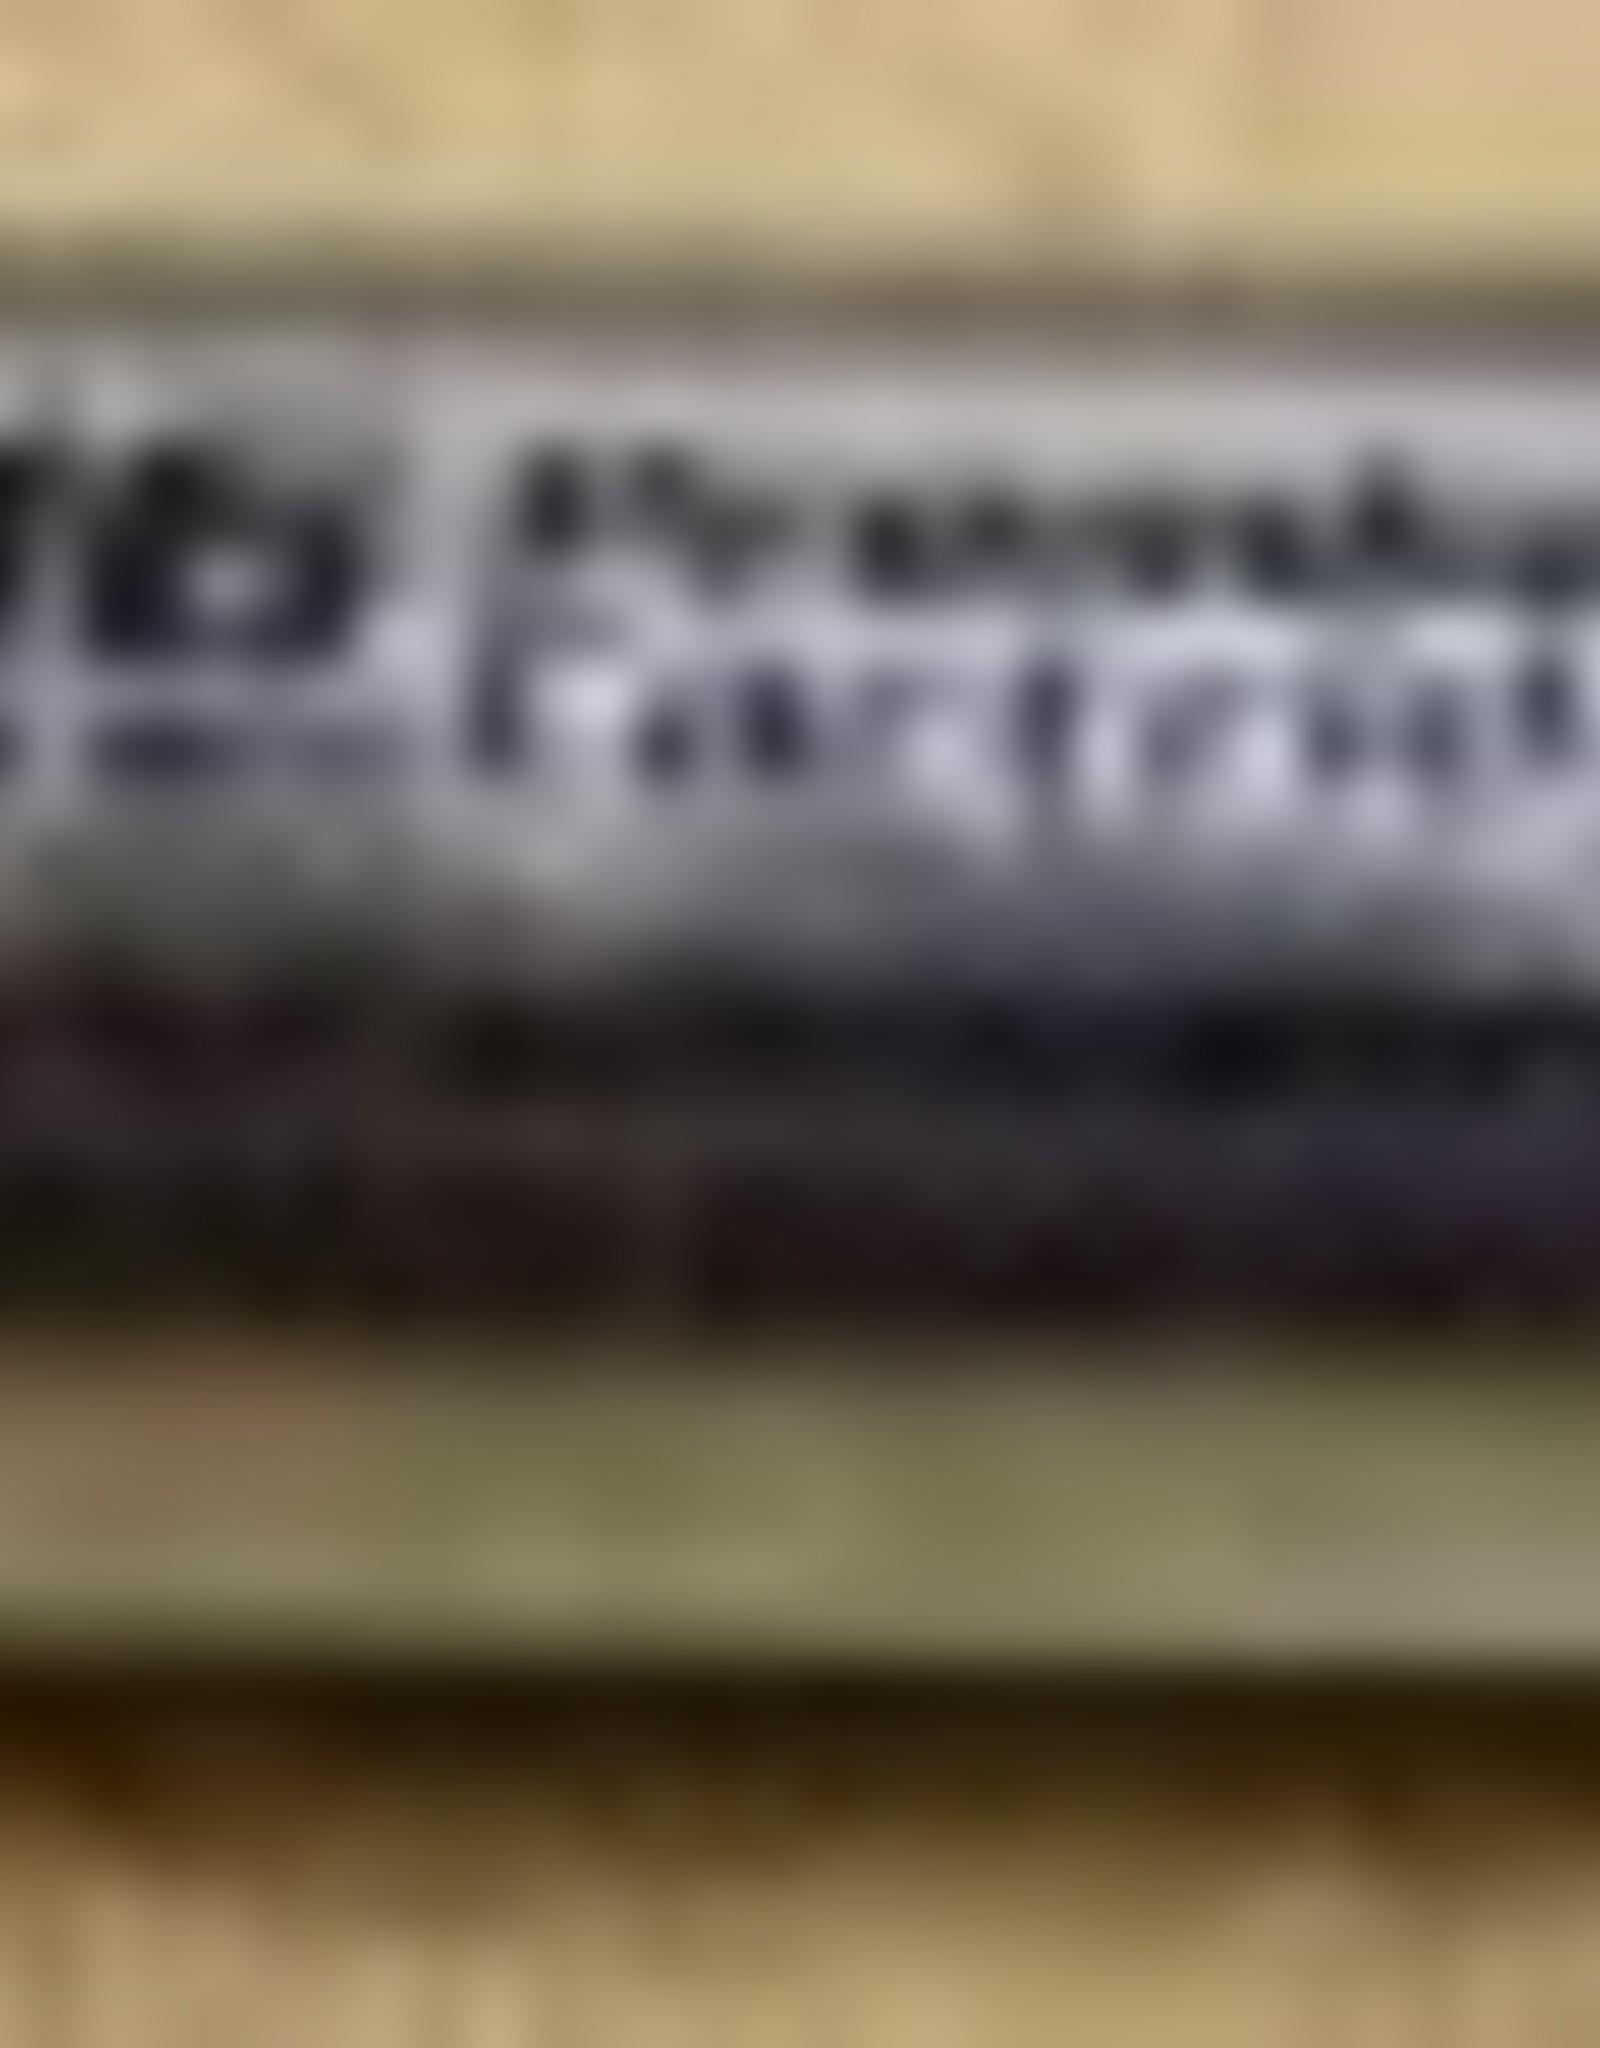 16g Unthreaded CO2 Cartridge (6)